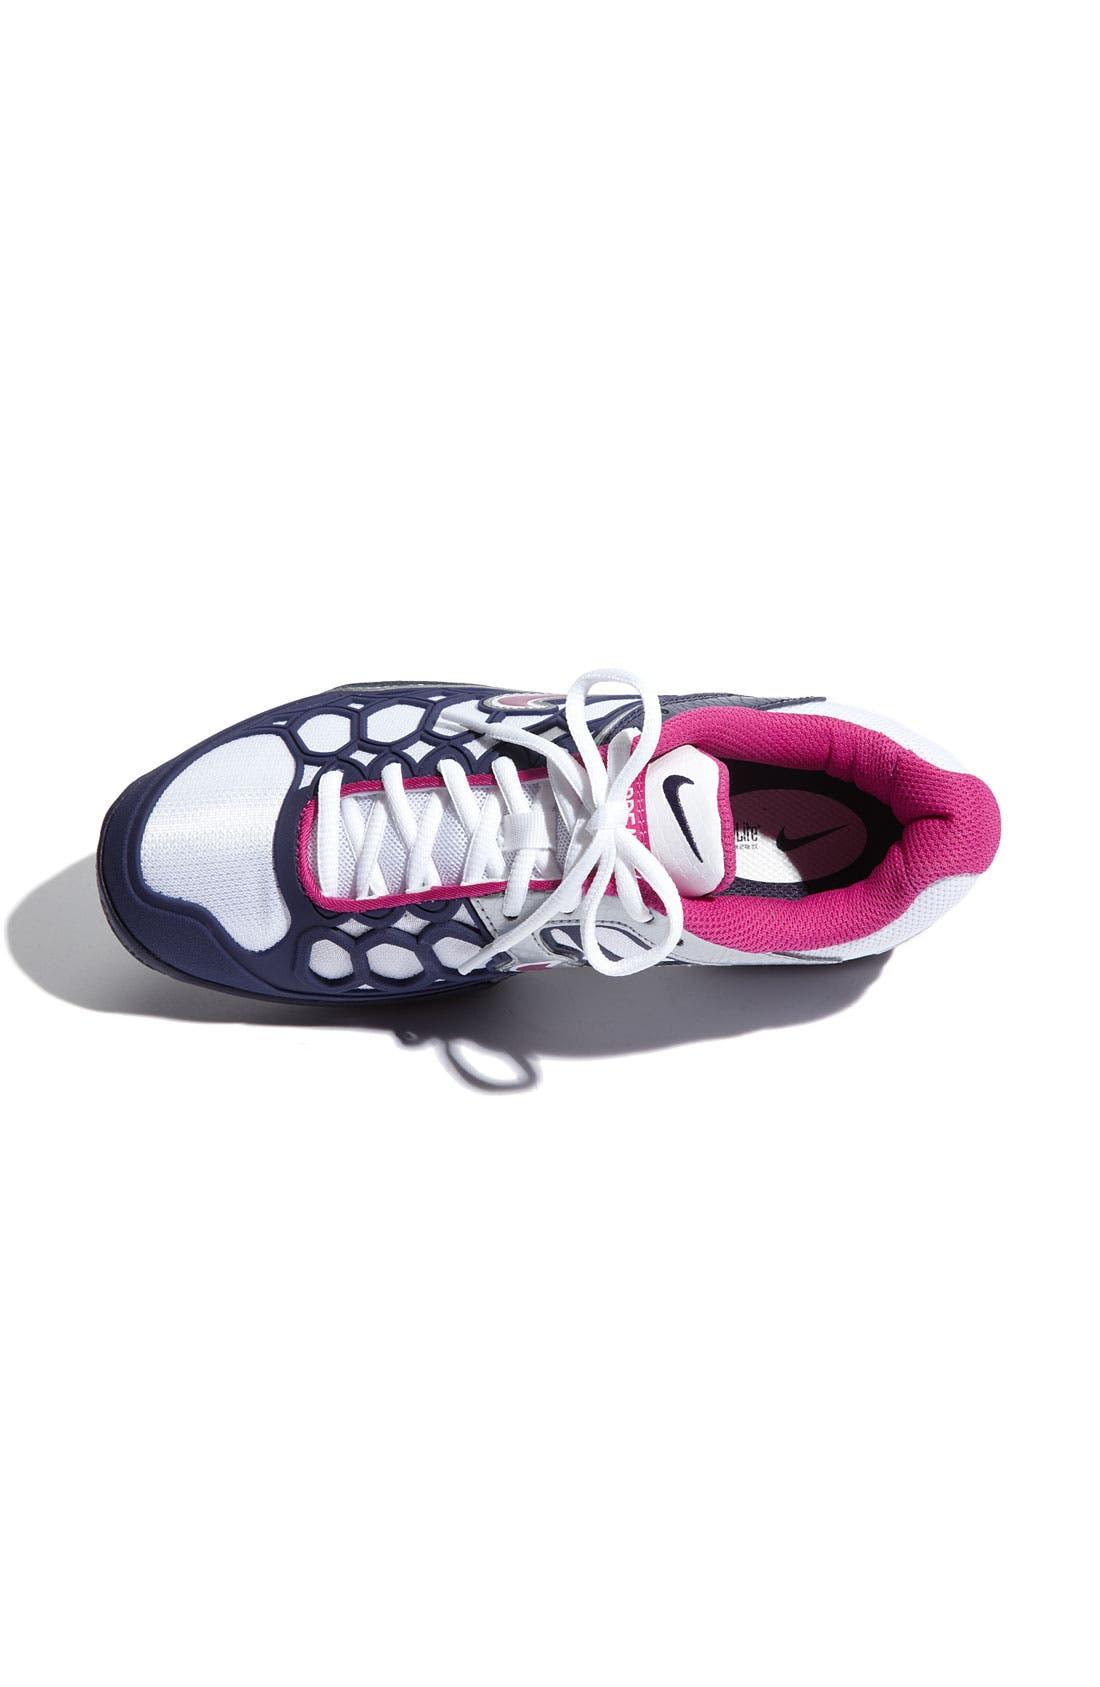 Alternate Image 3  - Nike 'Zoom Breathe 2' Tennis Shoe (Women)